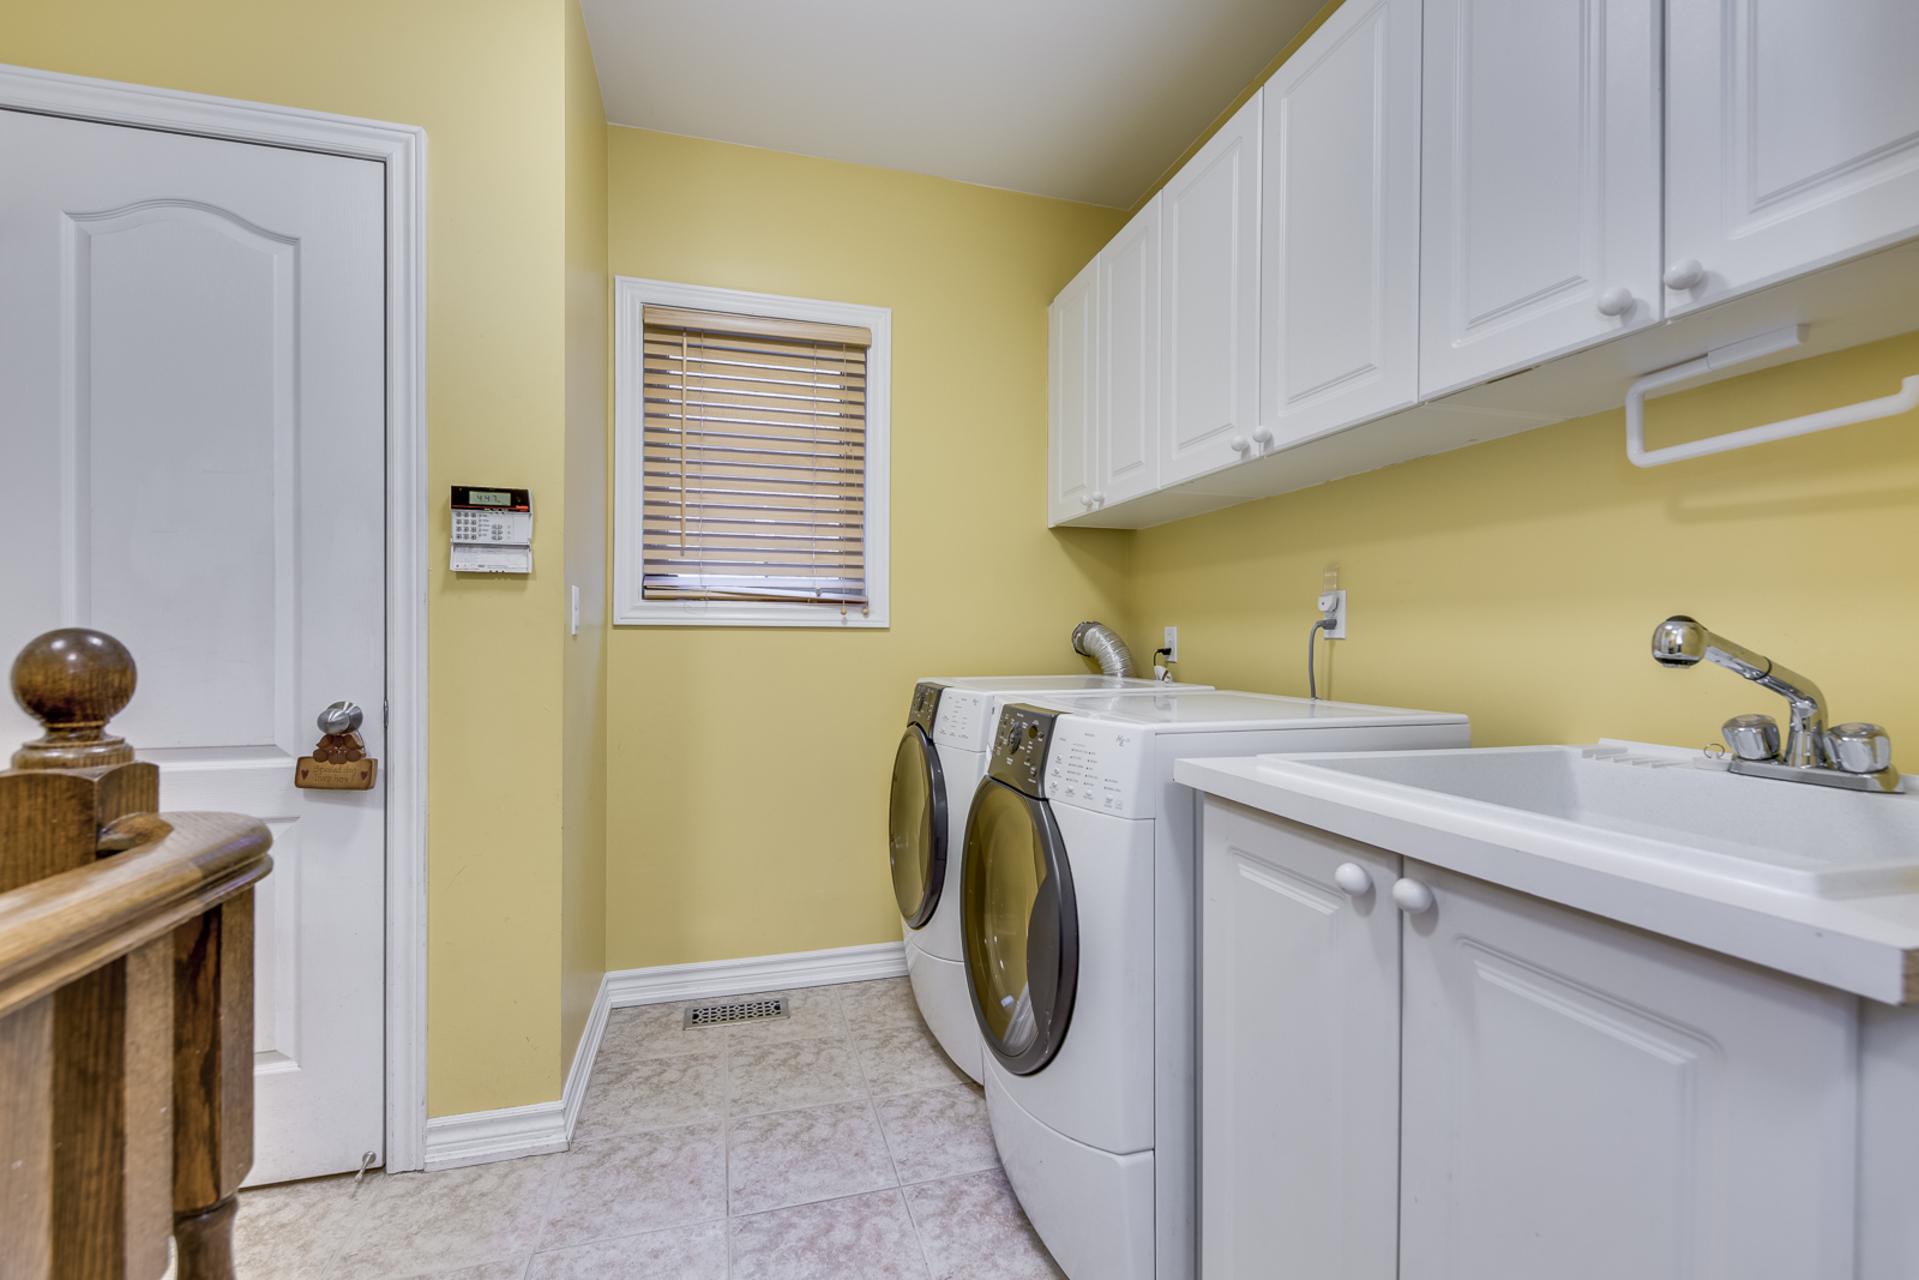 Laundry Room - 2395 Tesla Crescent, Oakville - Elite3 & Team at 2395 Tesla Crescent, Iroquois Ridge North, Oakville